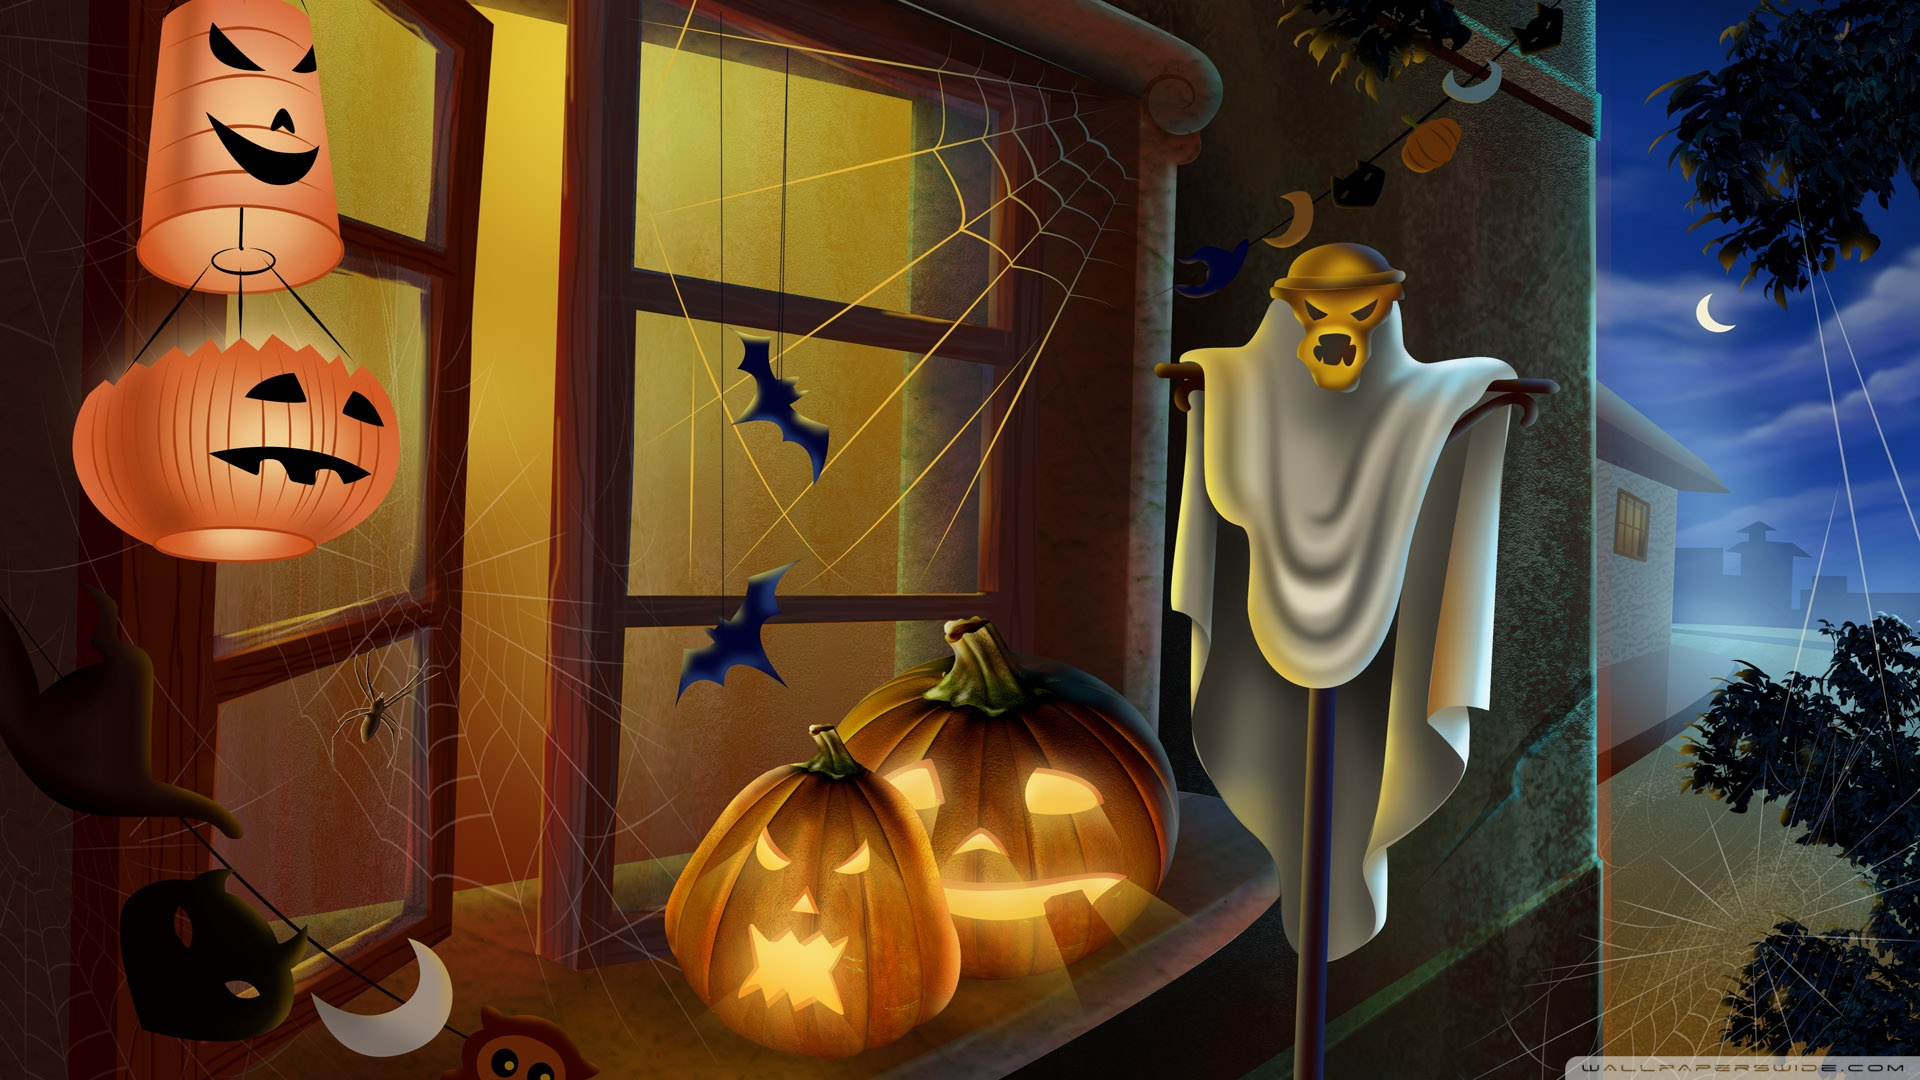 Spooky House Bats Scary Pumpkin Spider Web Hallowmas Halloween 1920x1080